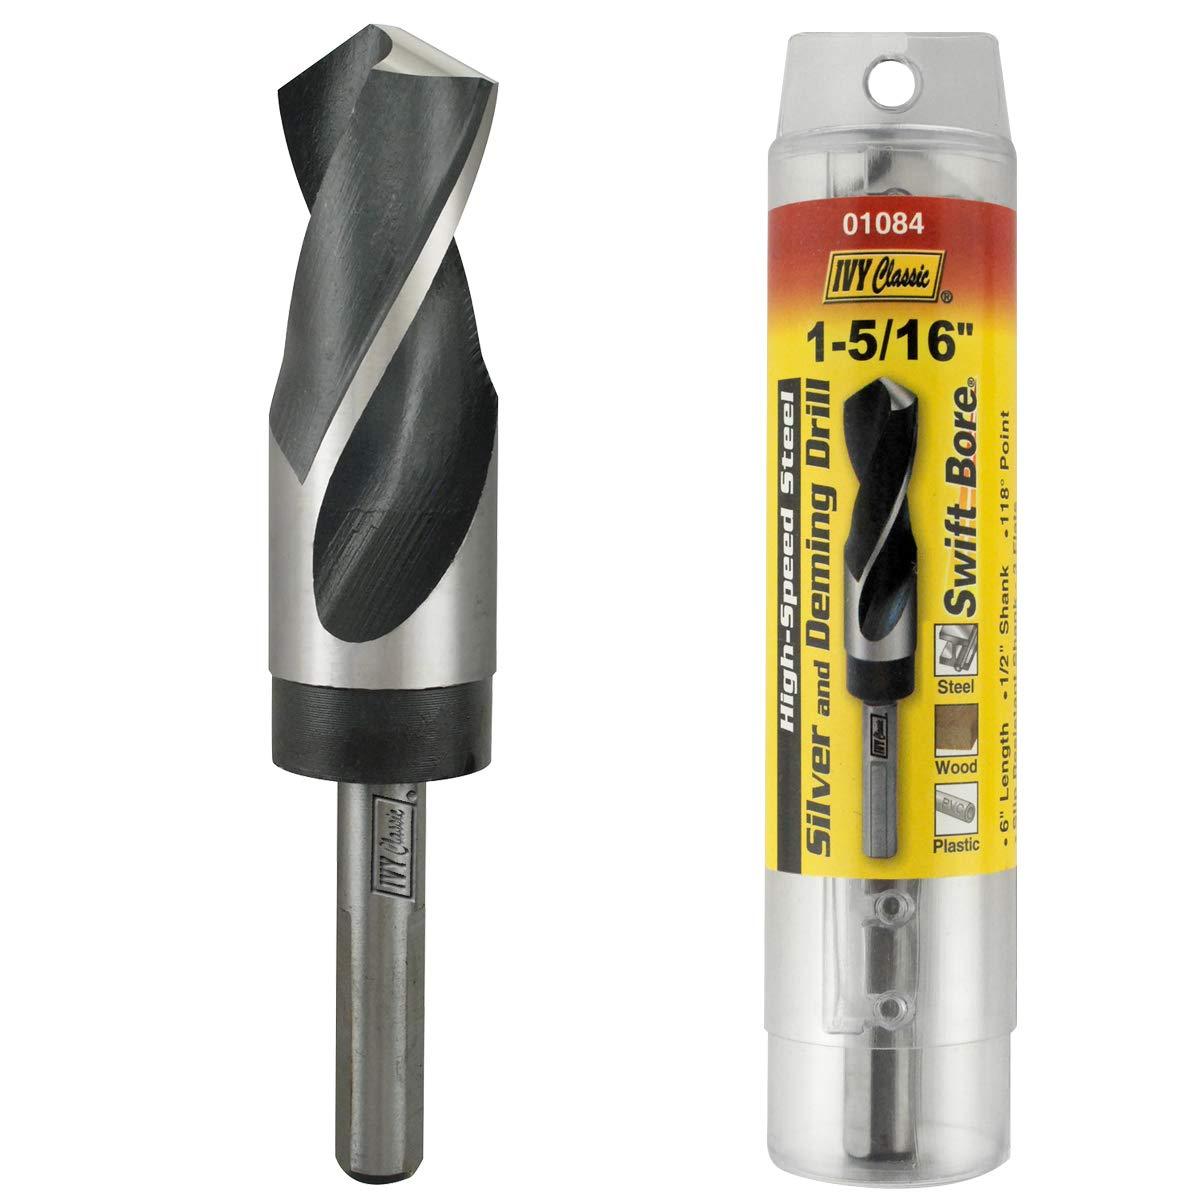 1//2 Shank Ivy Classic 01084 1-5//16 x 6 Silver /& Deming Drill Bit